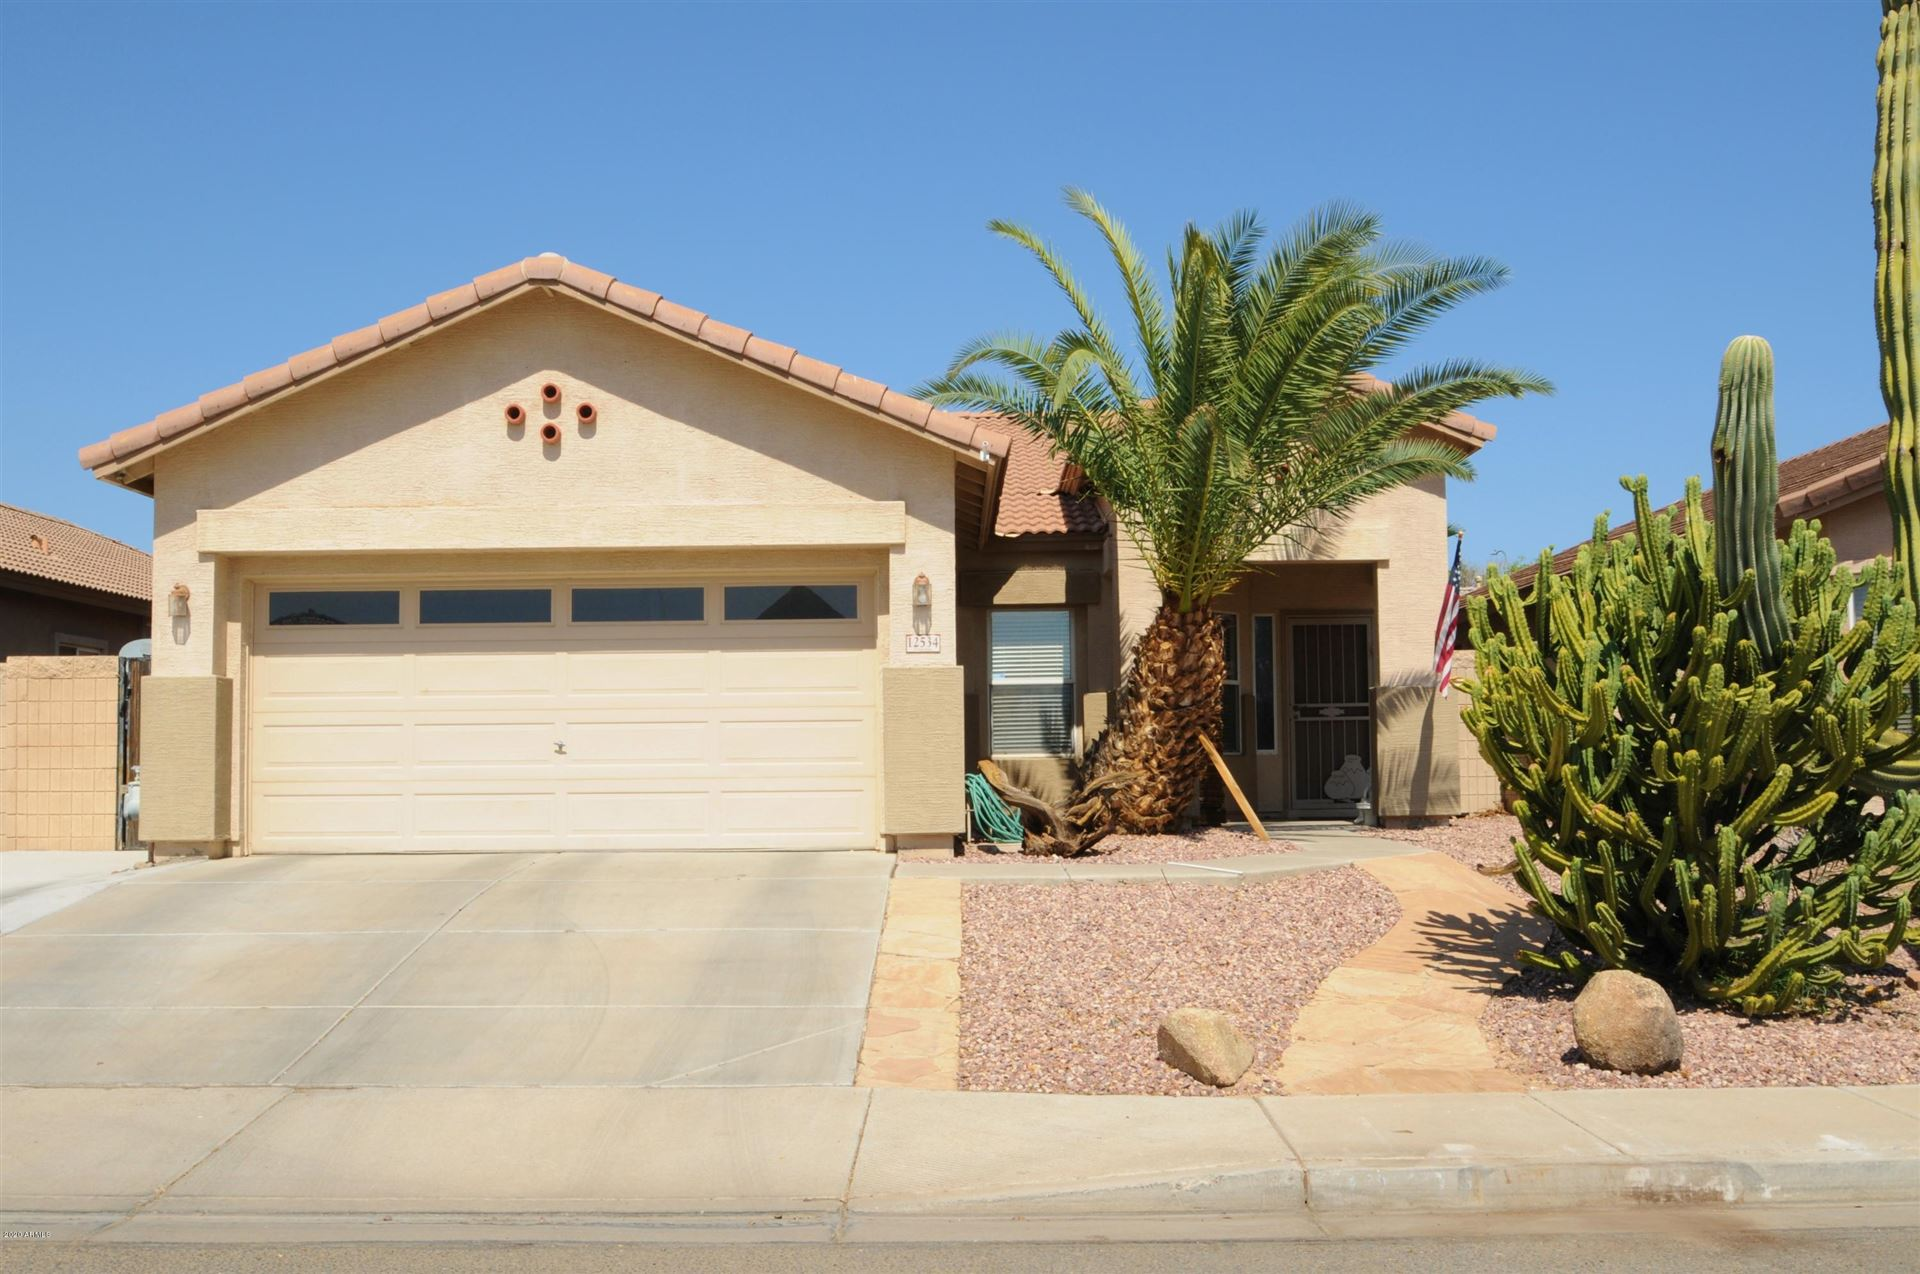 12534 W JEFFERSON Street, Avondale, AZ 85323 - MLS#: 6137789